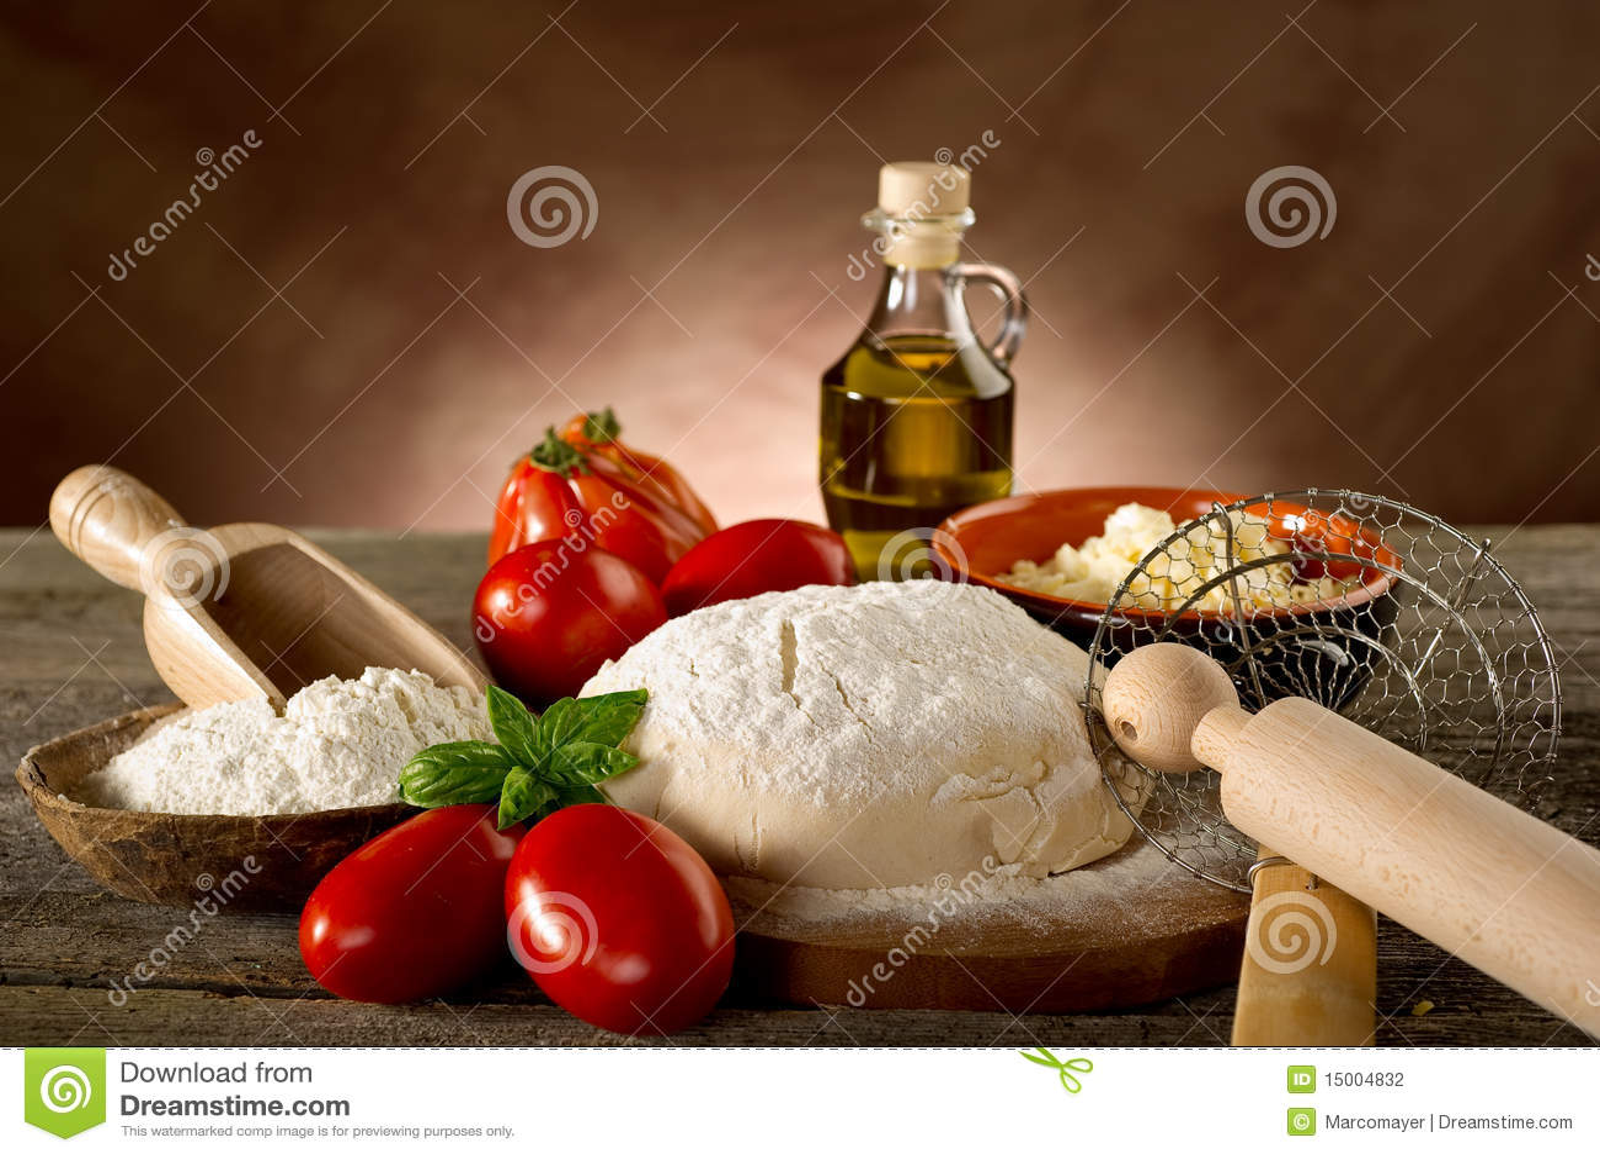 Ingredienti per pizza casalinga fotografia stock - Cucina casalinga per cani dosi ...